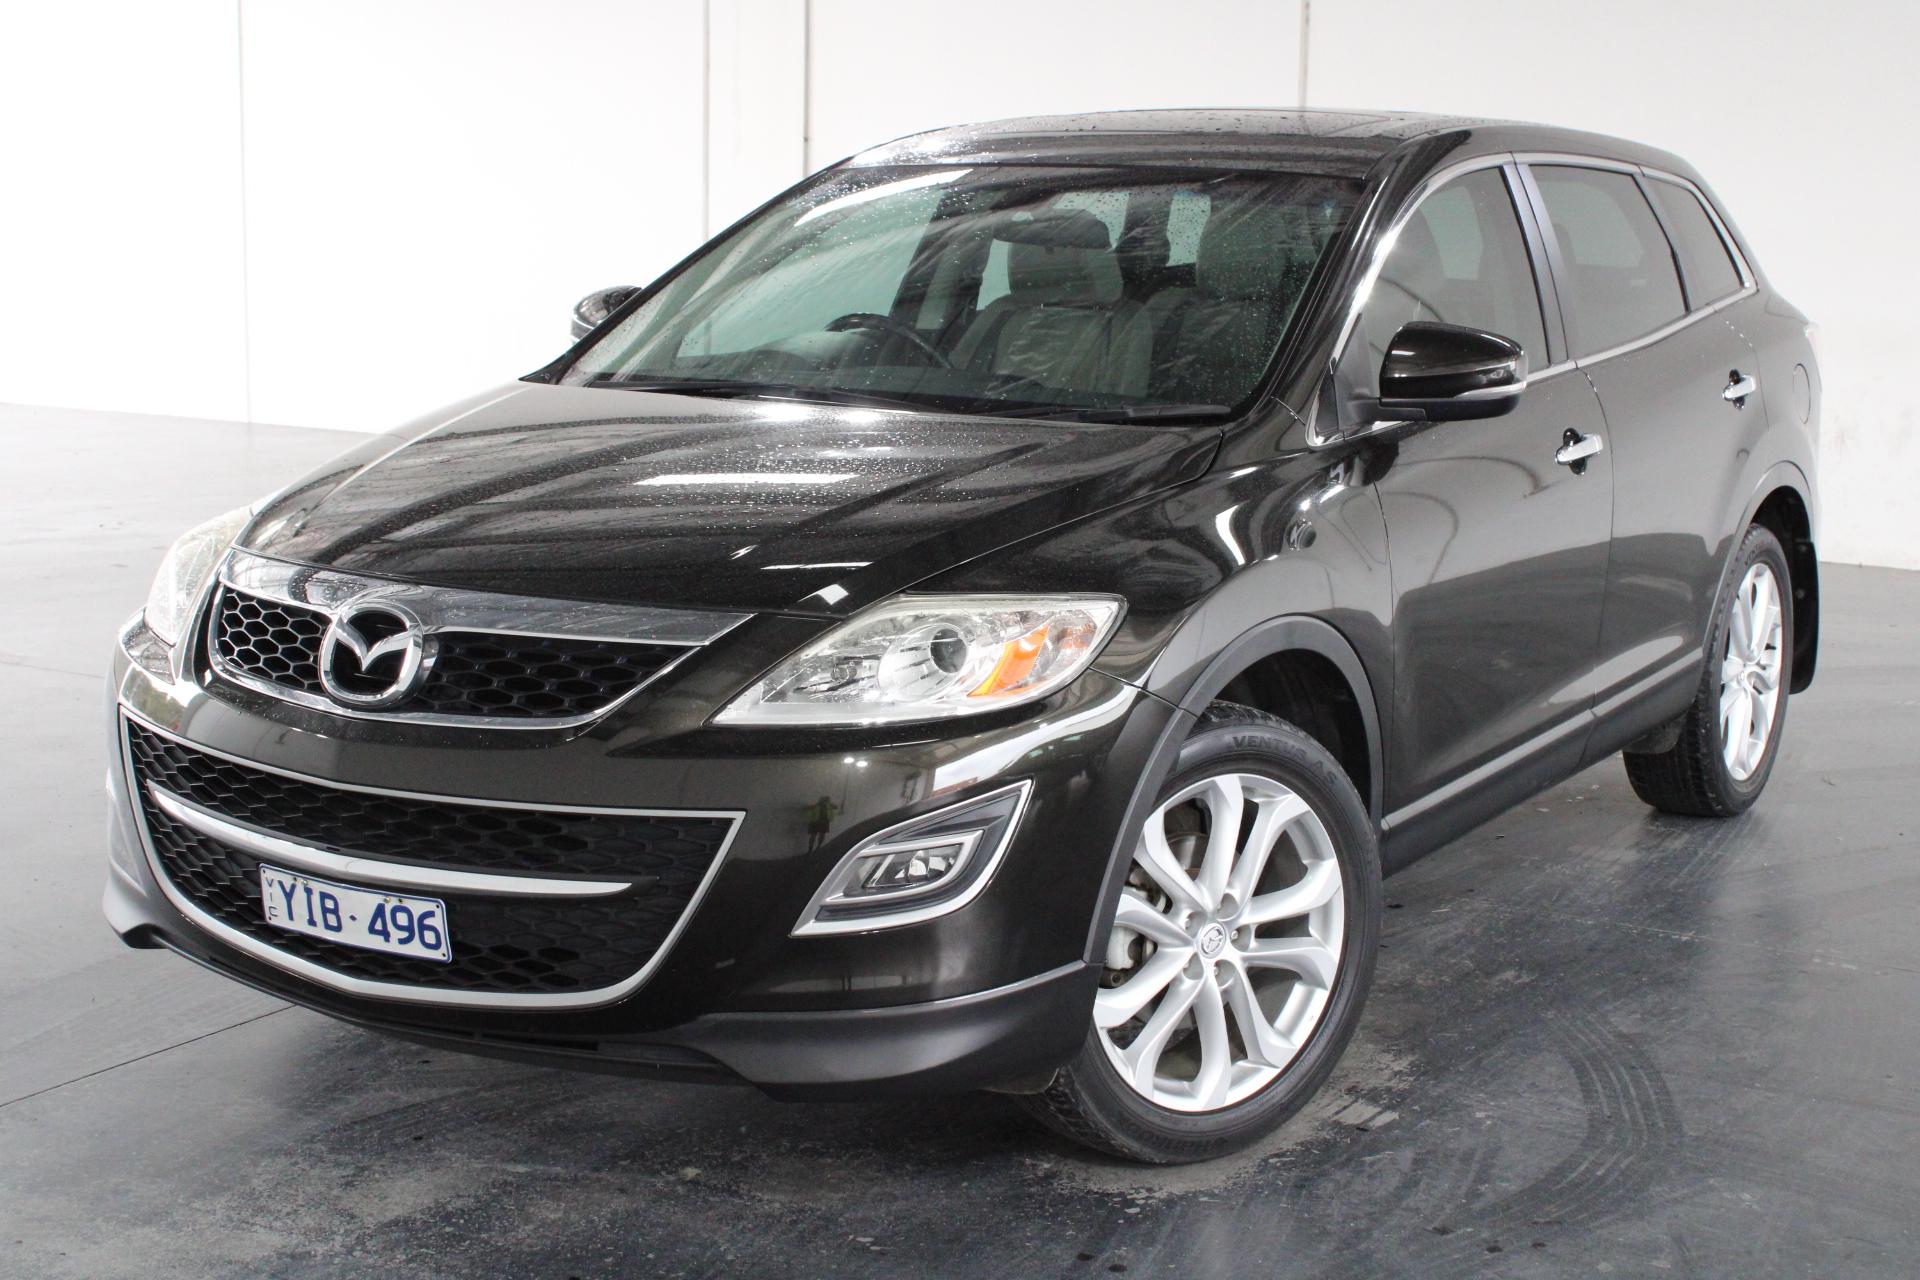 2011 Mazda CX-9 Luxury (FWD) Automatic 7 Seats Wagon